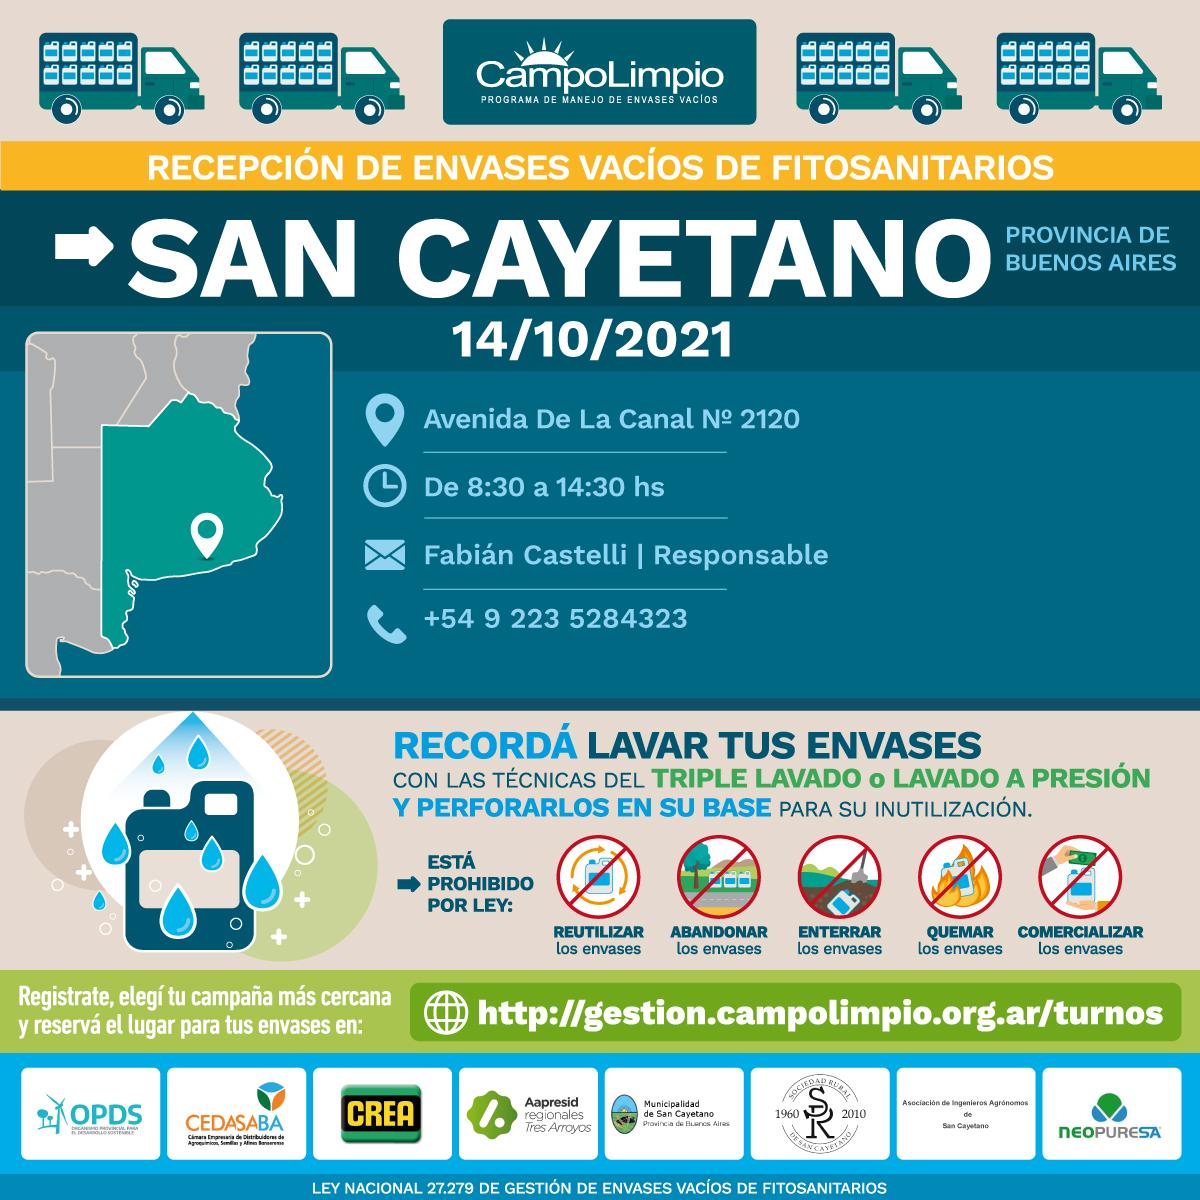 San Cayetano: Campaña de recepción de envases vacíos de fitosanitarios